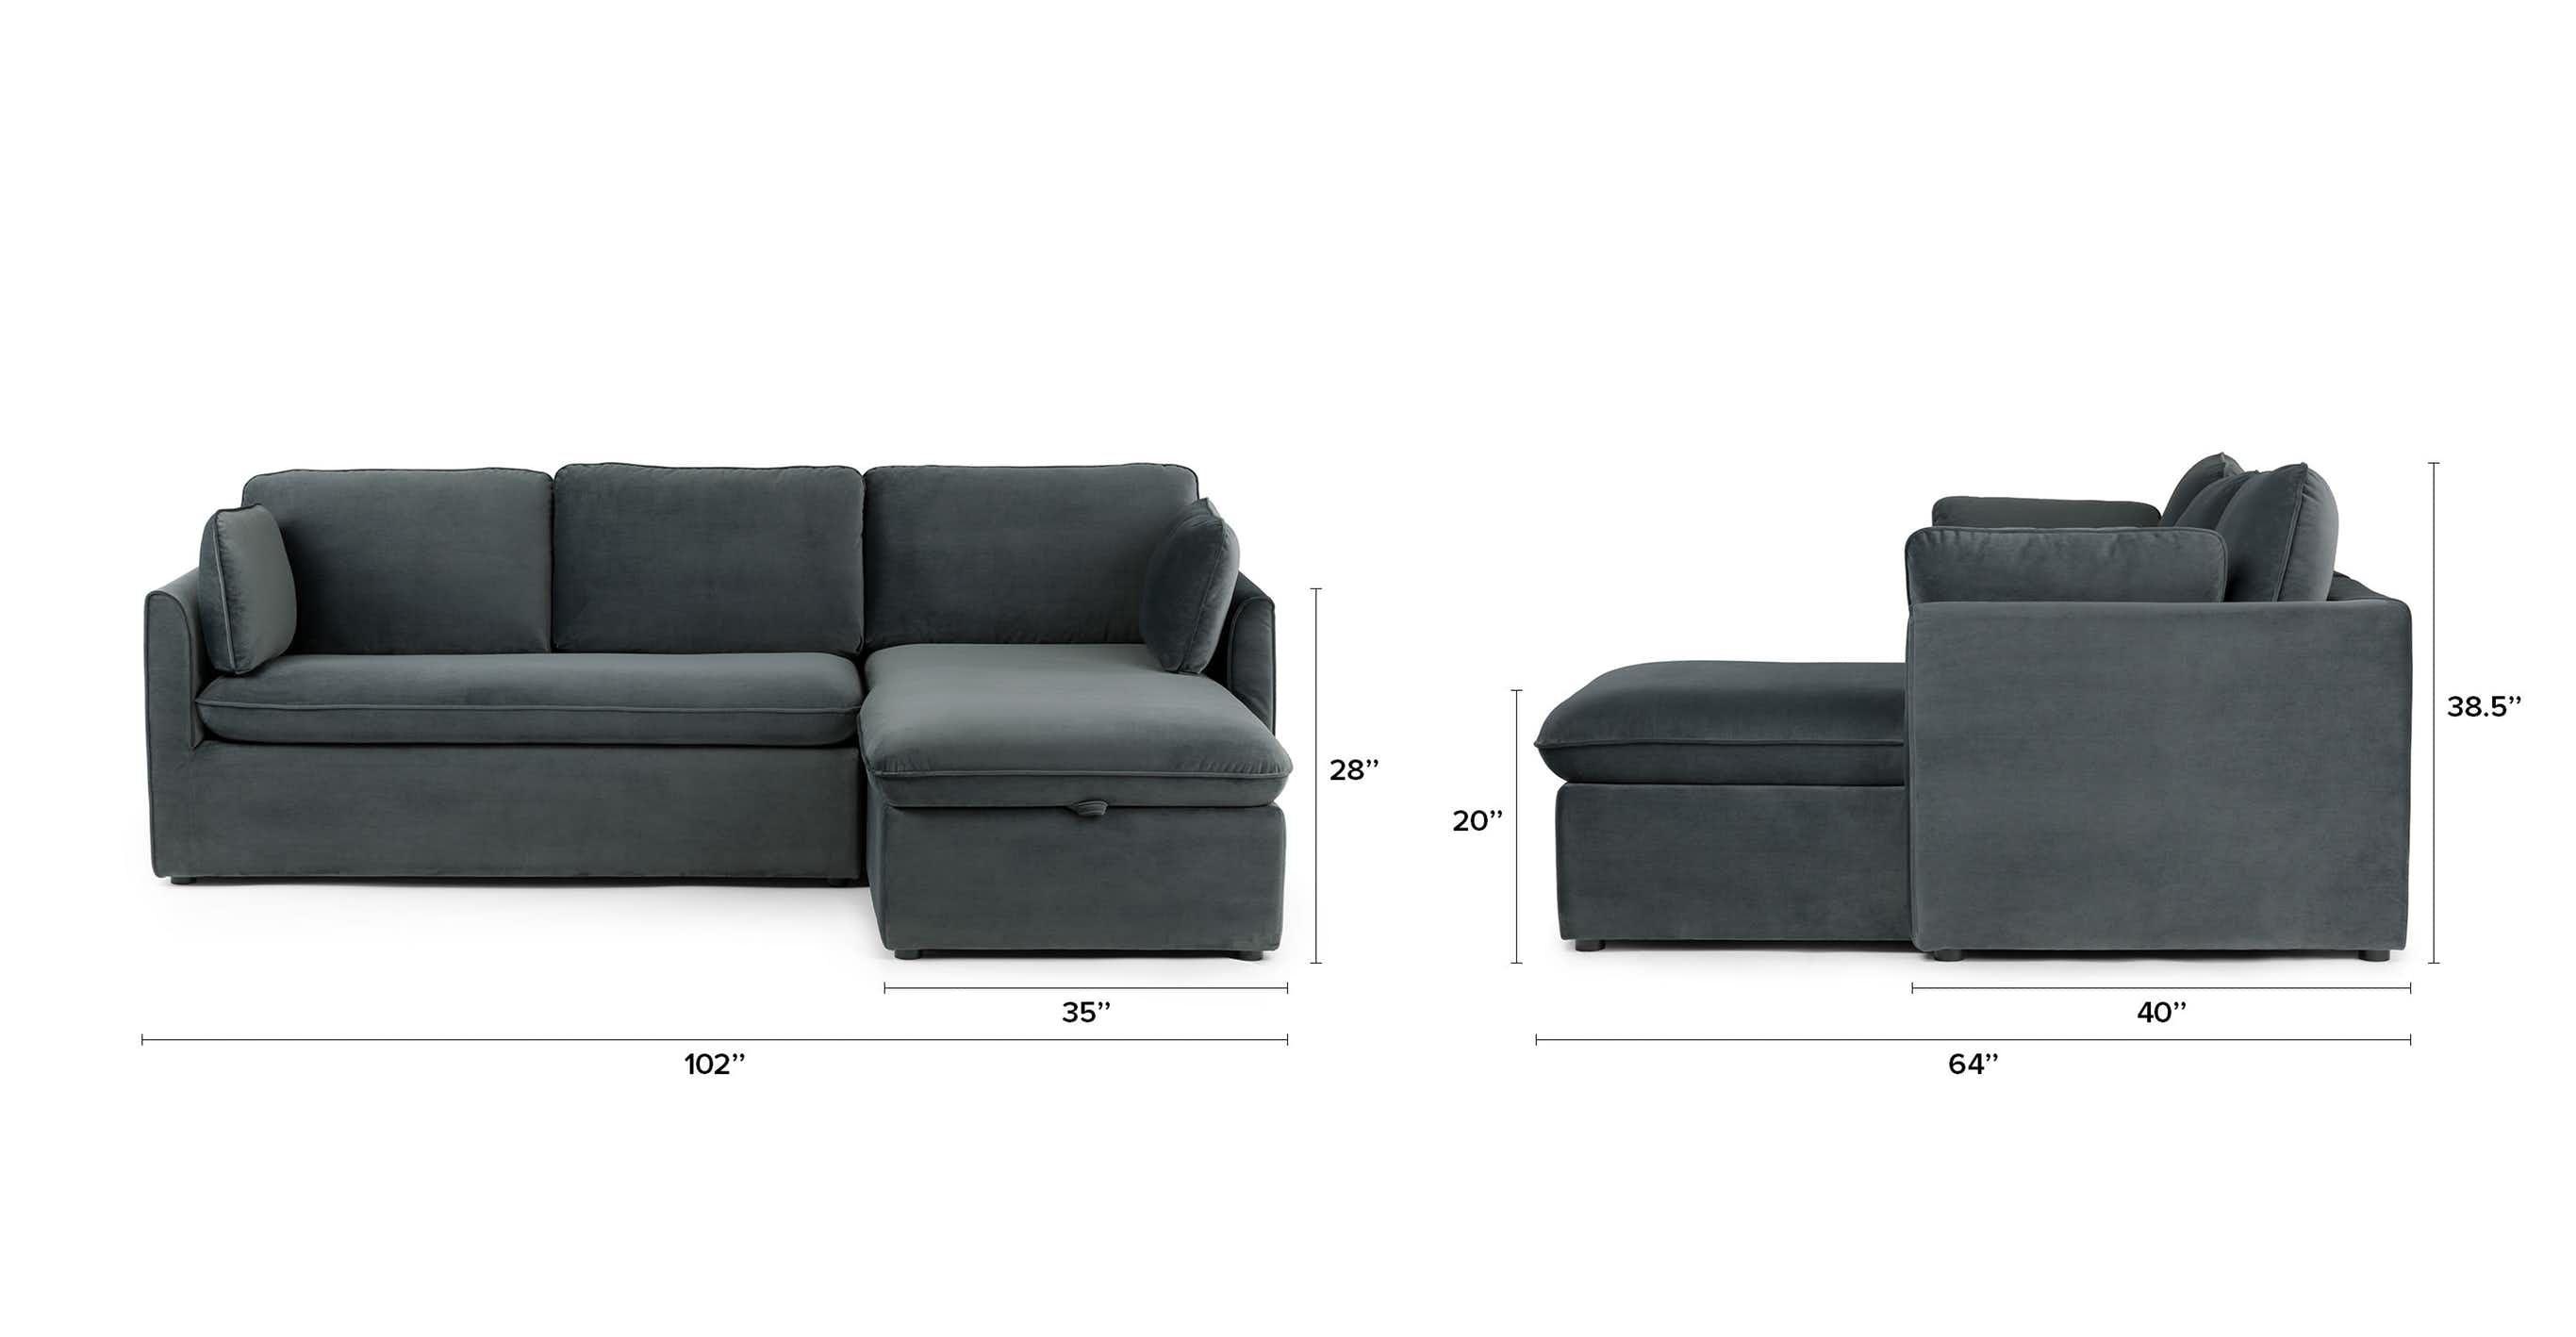 Leggett And Platt Sofa Bed Mechanisms Coffee Tables Ideas